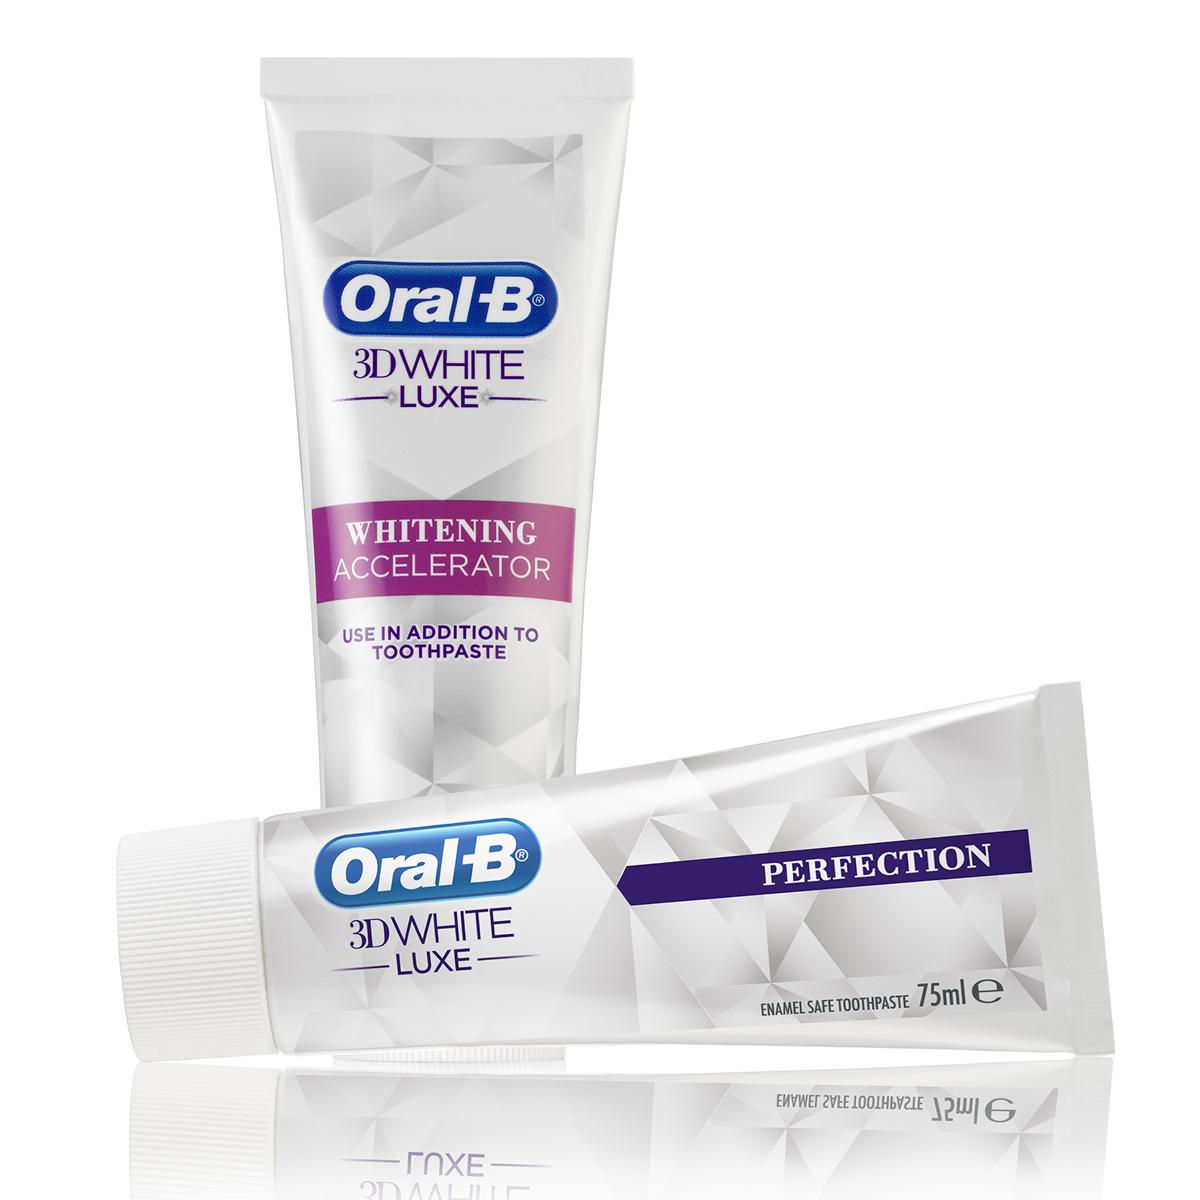 oral b whitening accelerator sverige